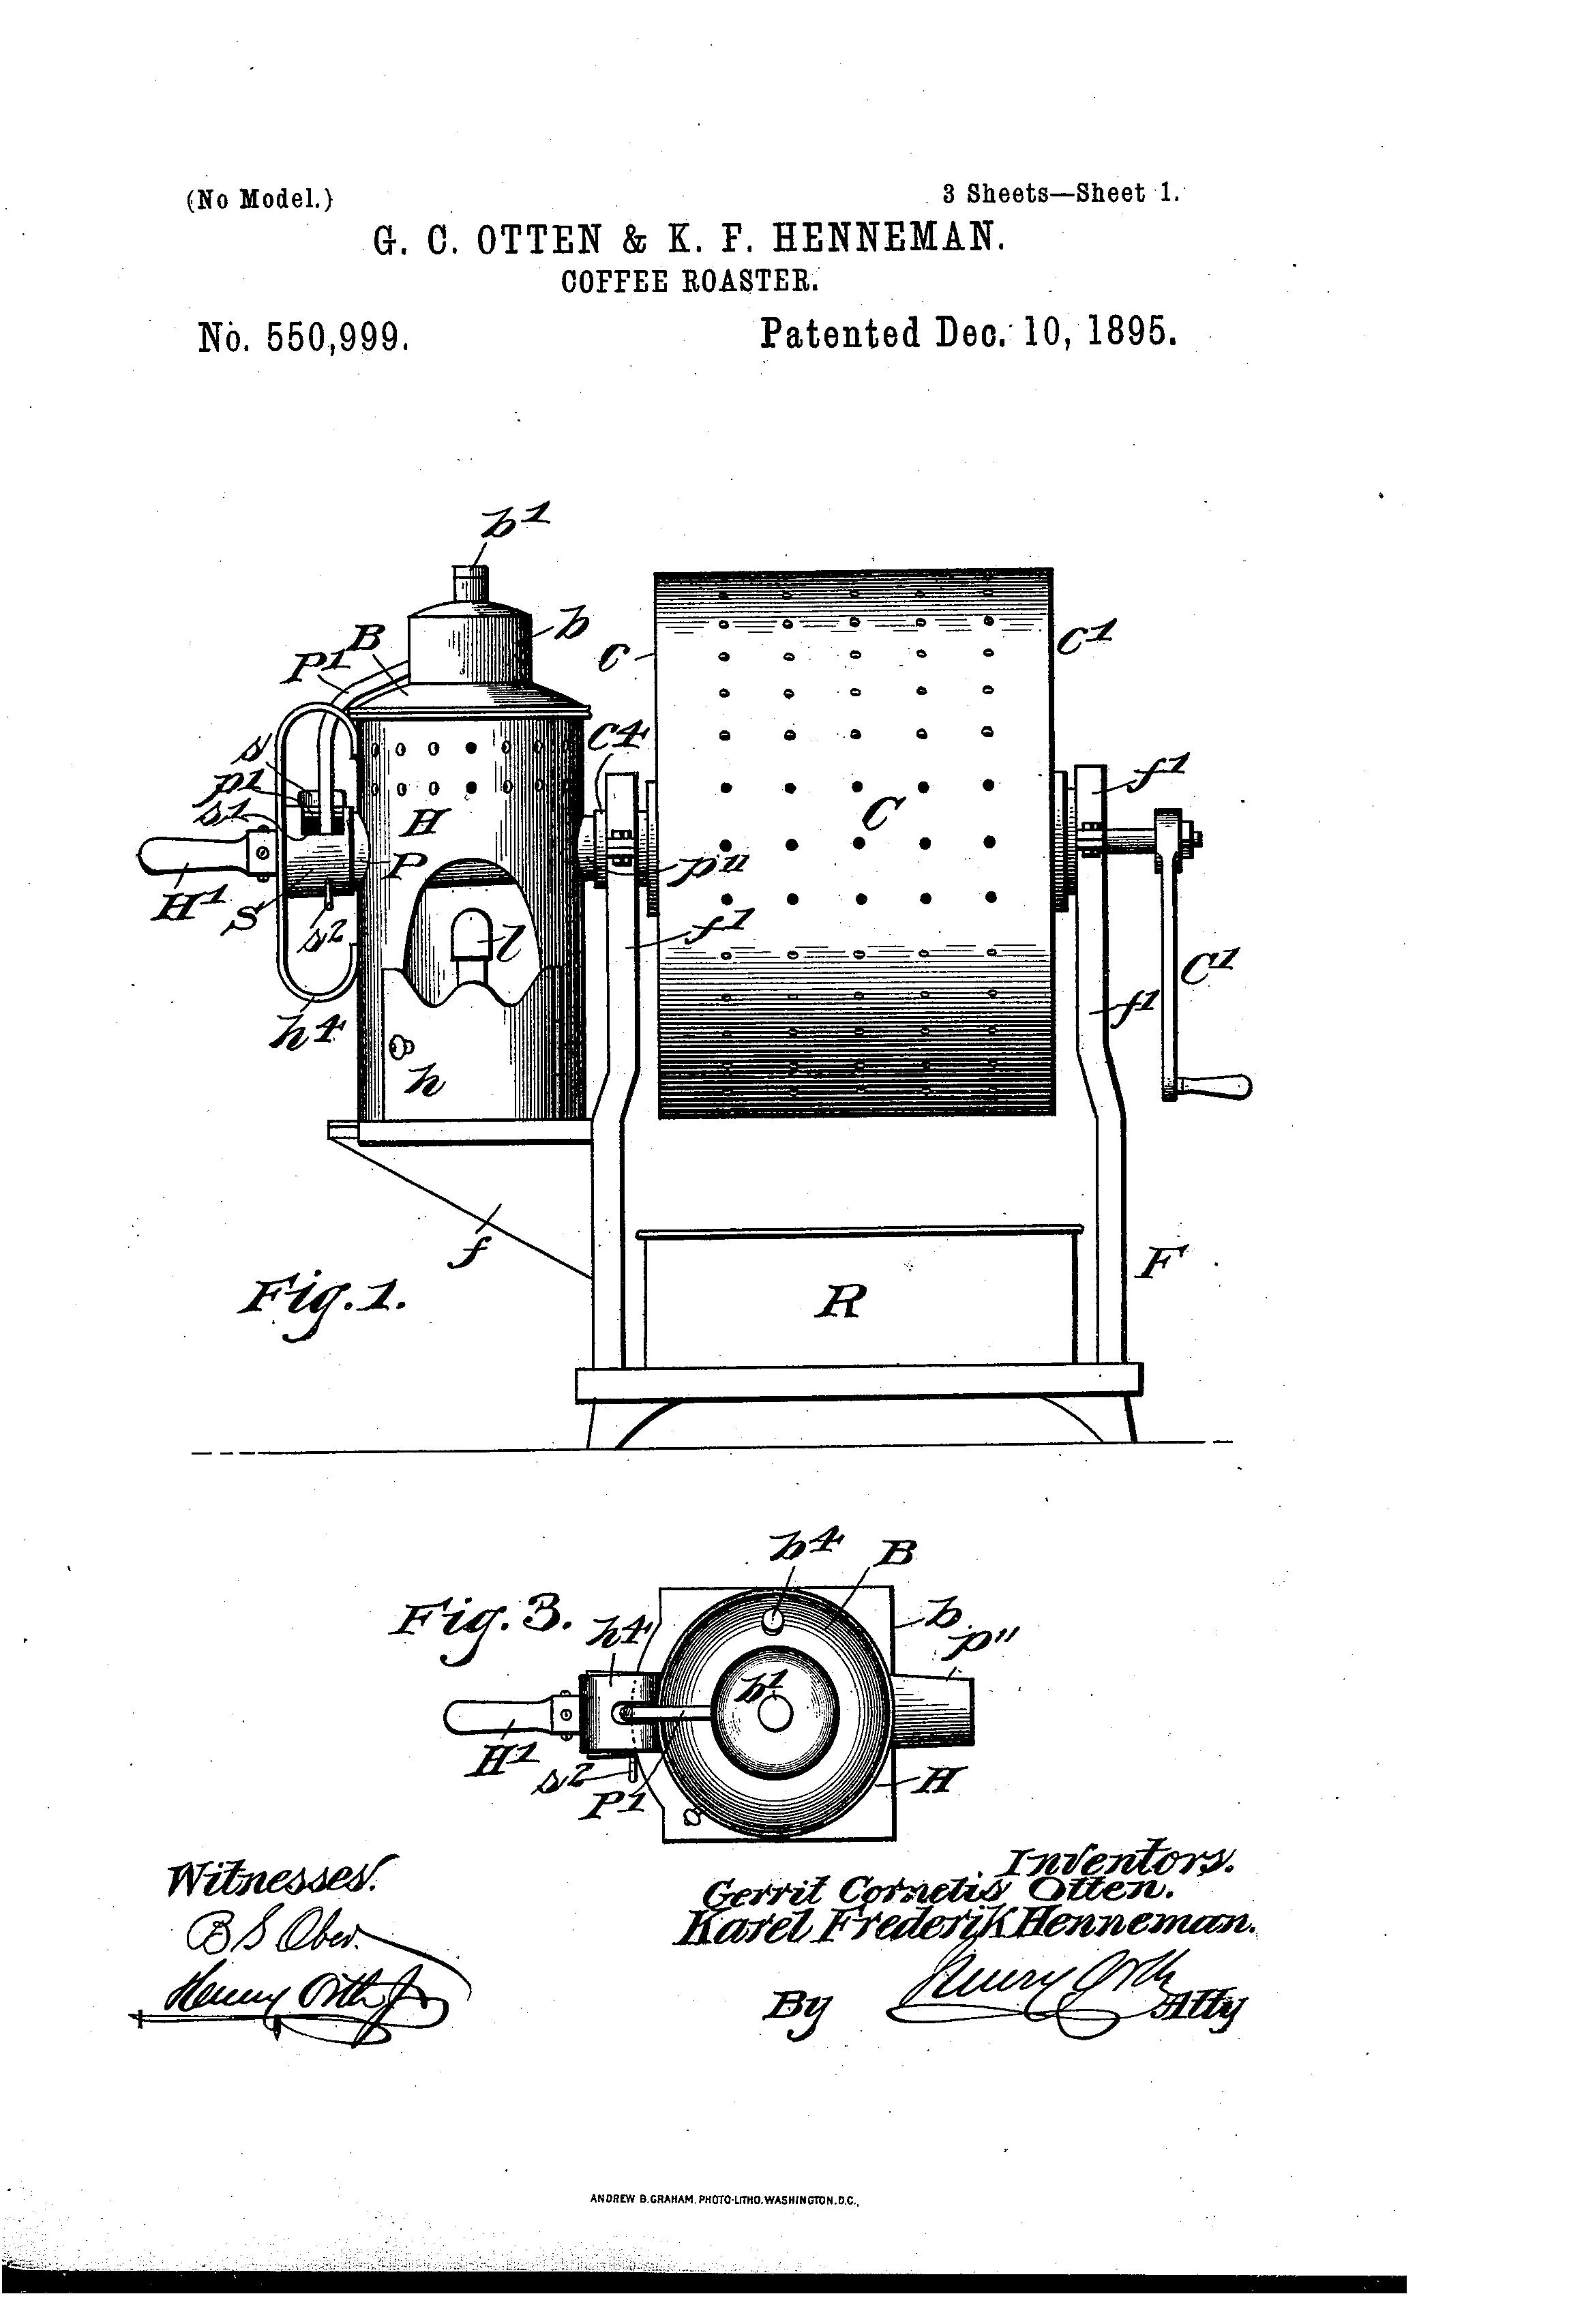 Henneman Coffee Roaster Patent Drawing